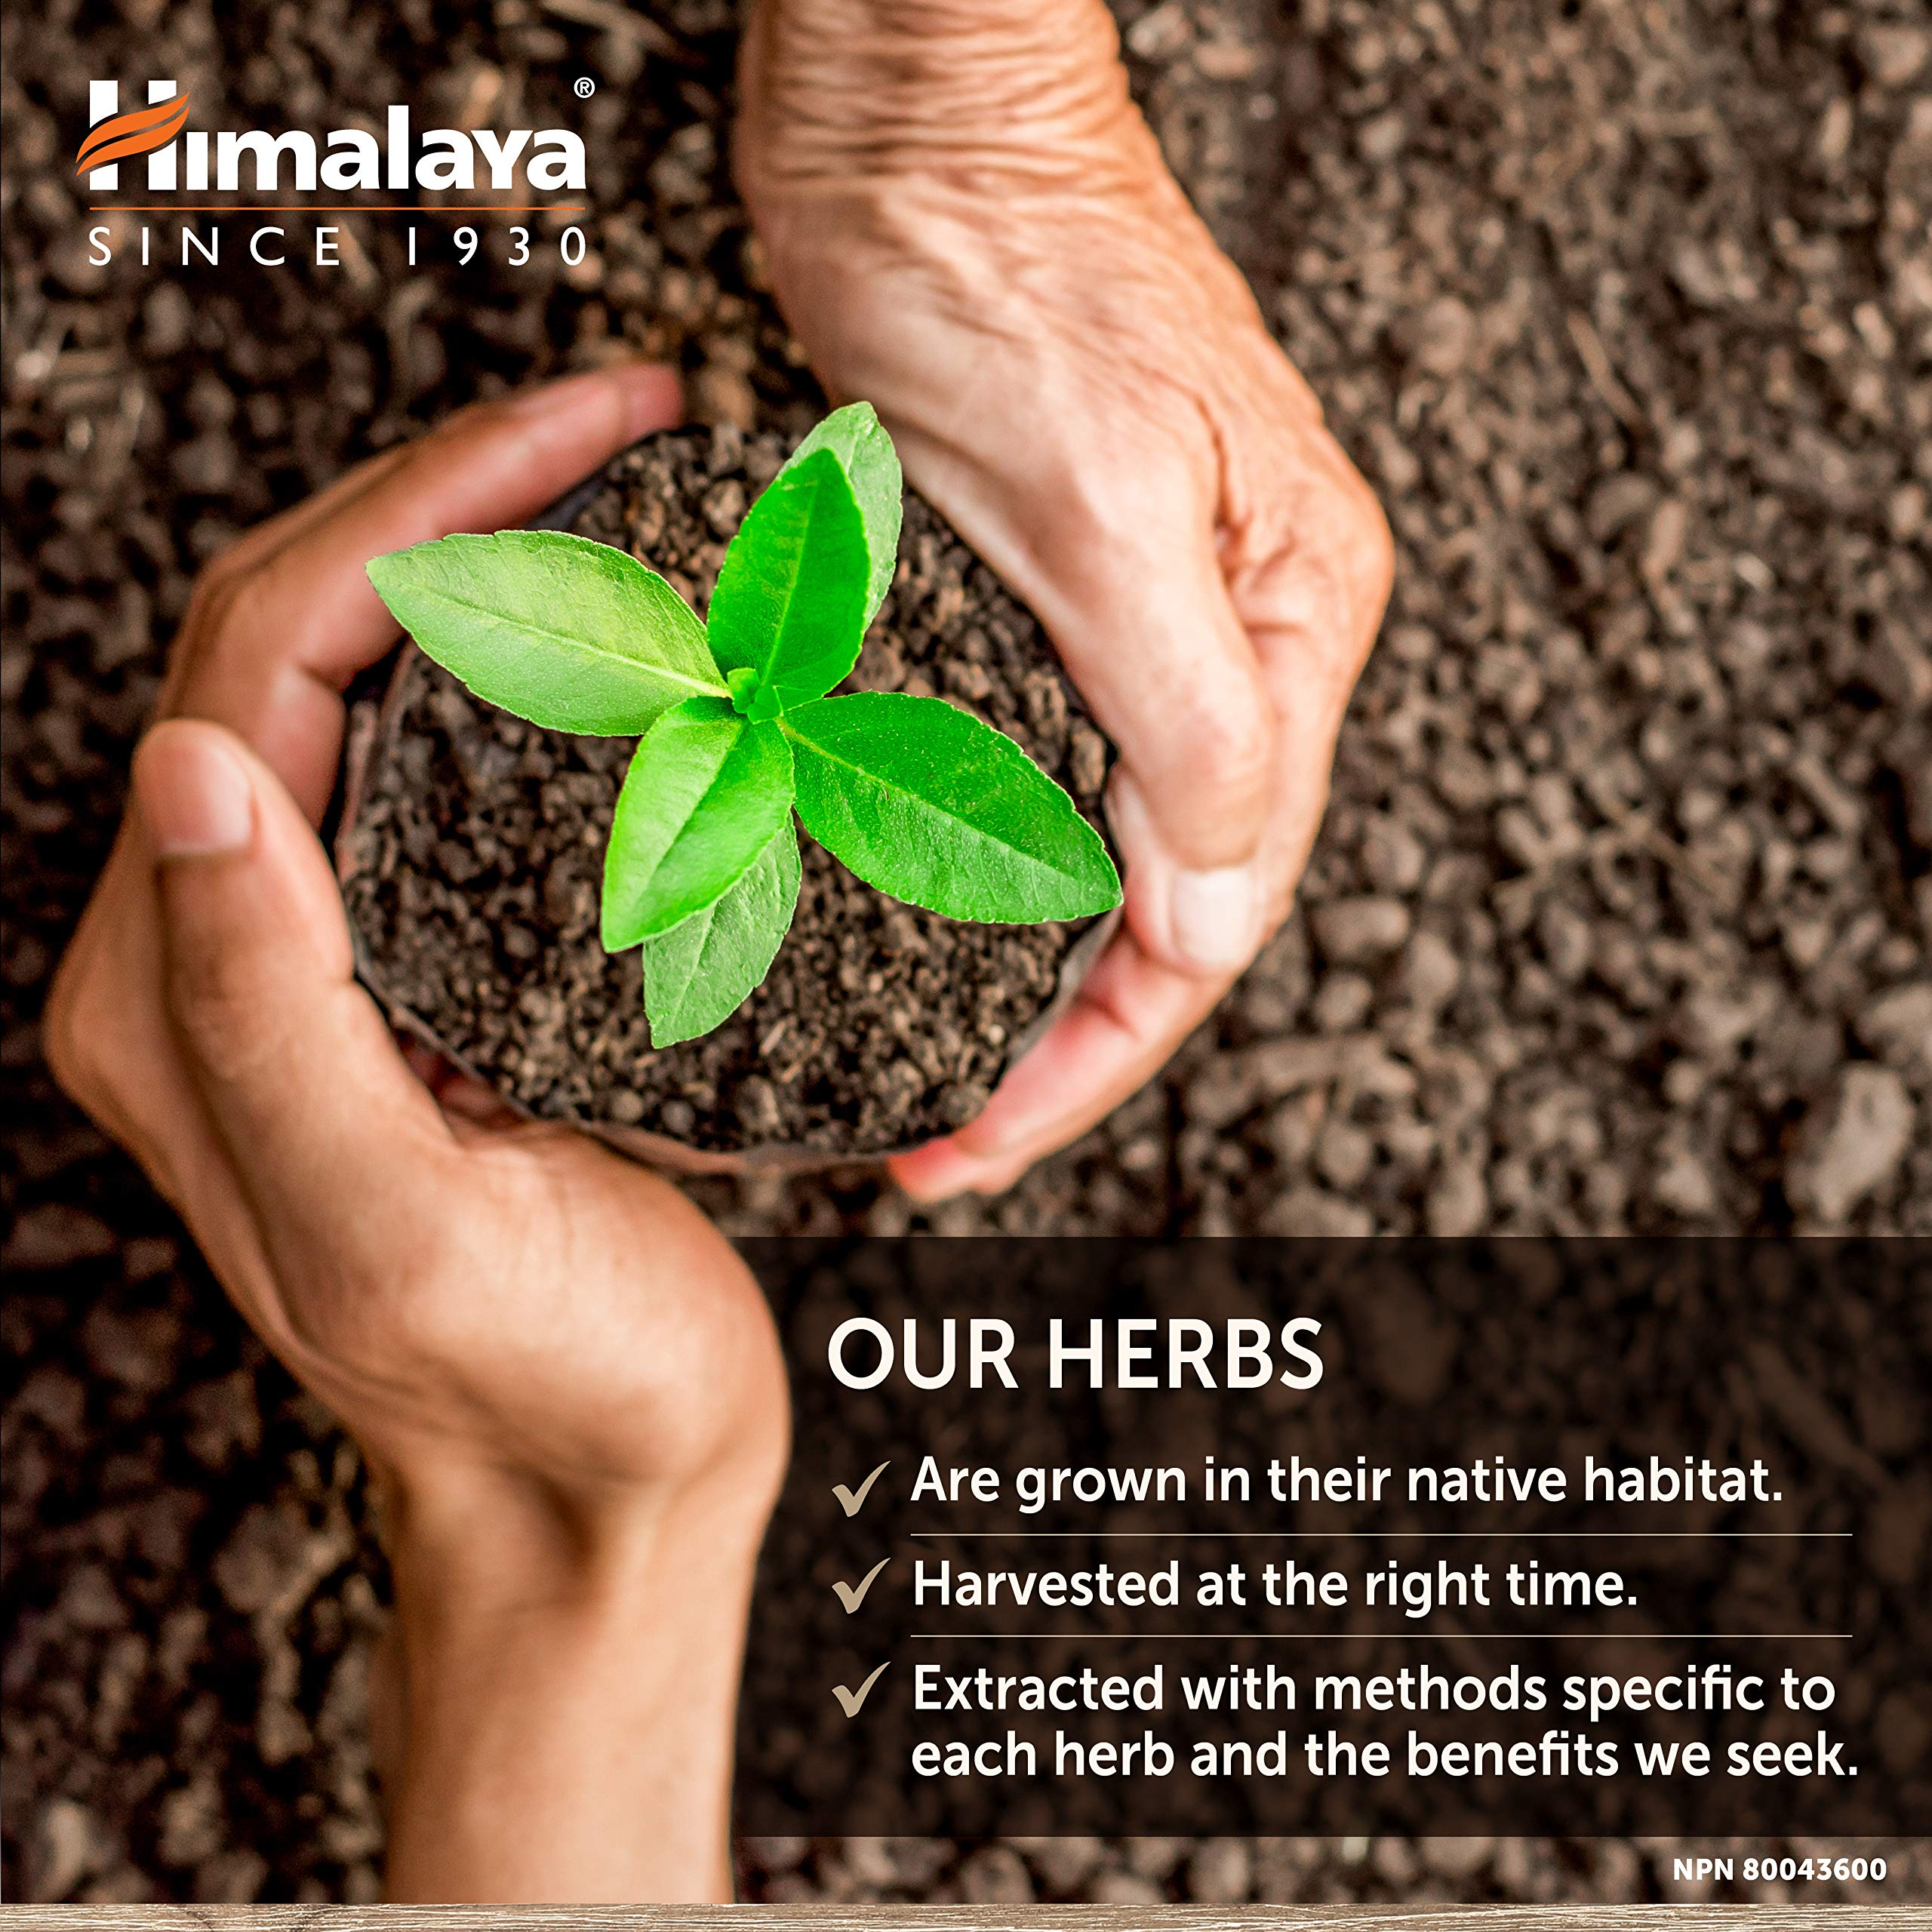 Himalaya Organic Arjuna 60 Caplets for Cholesterol, Blood Pressure & Healthy Heart Function Support 700mg